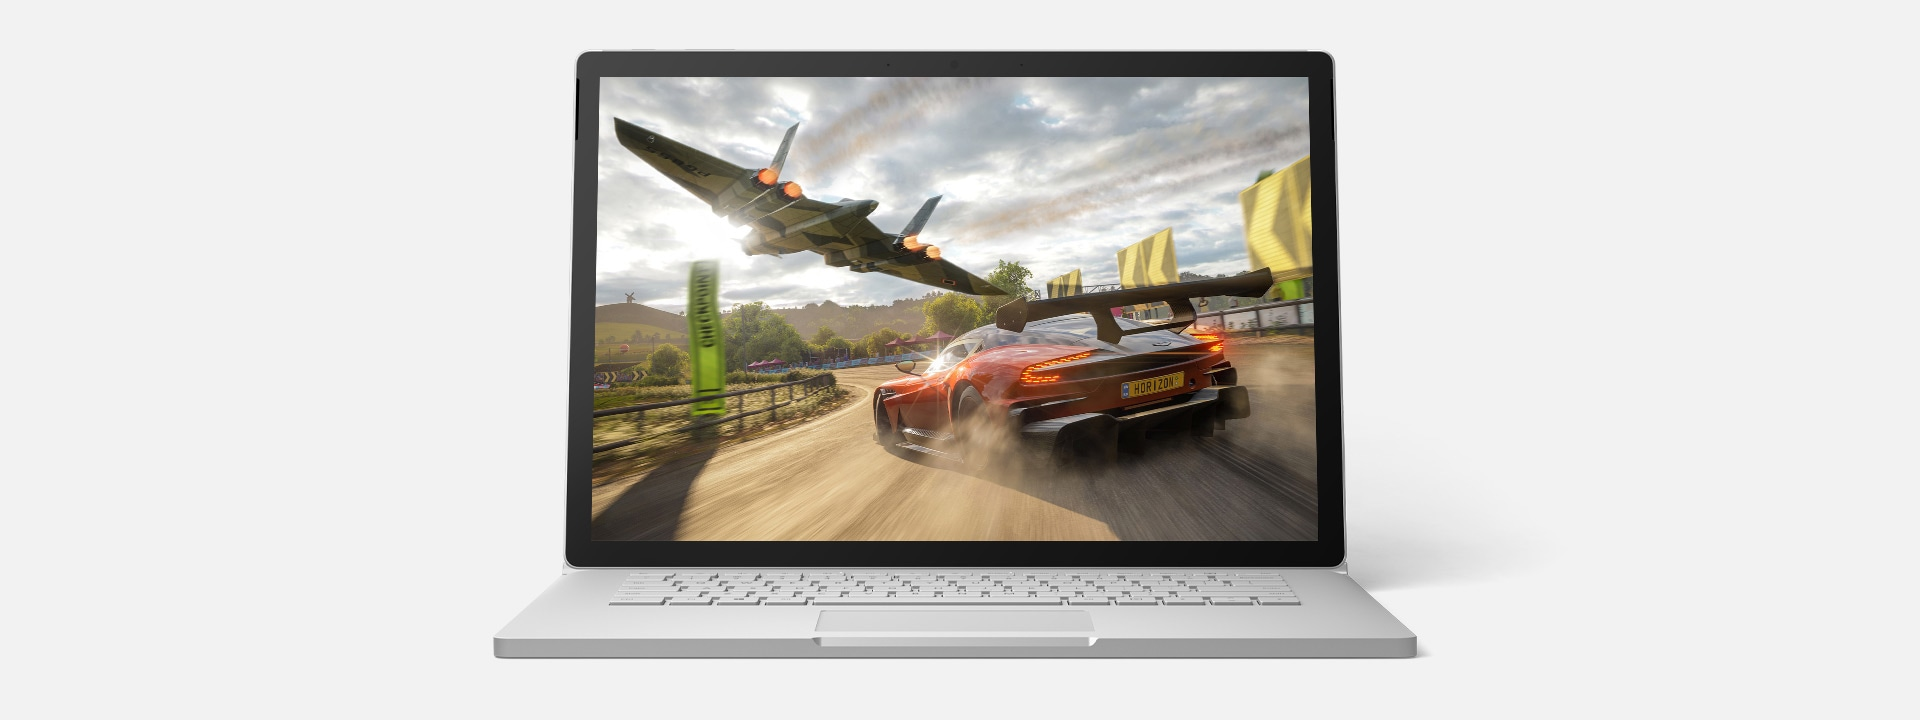 Surface Book3 exécutant un jeu Xbox